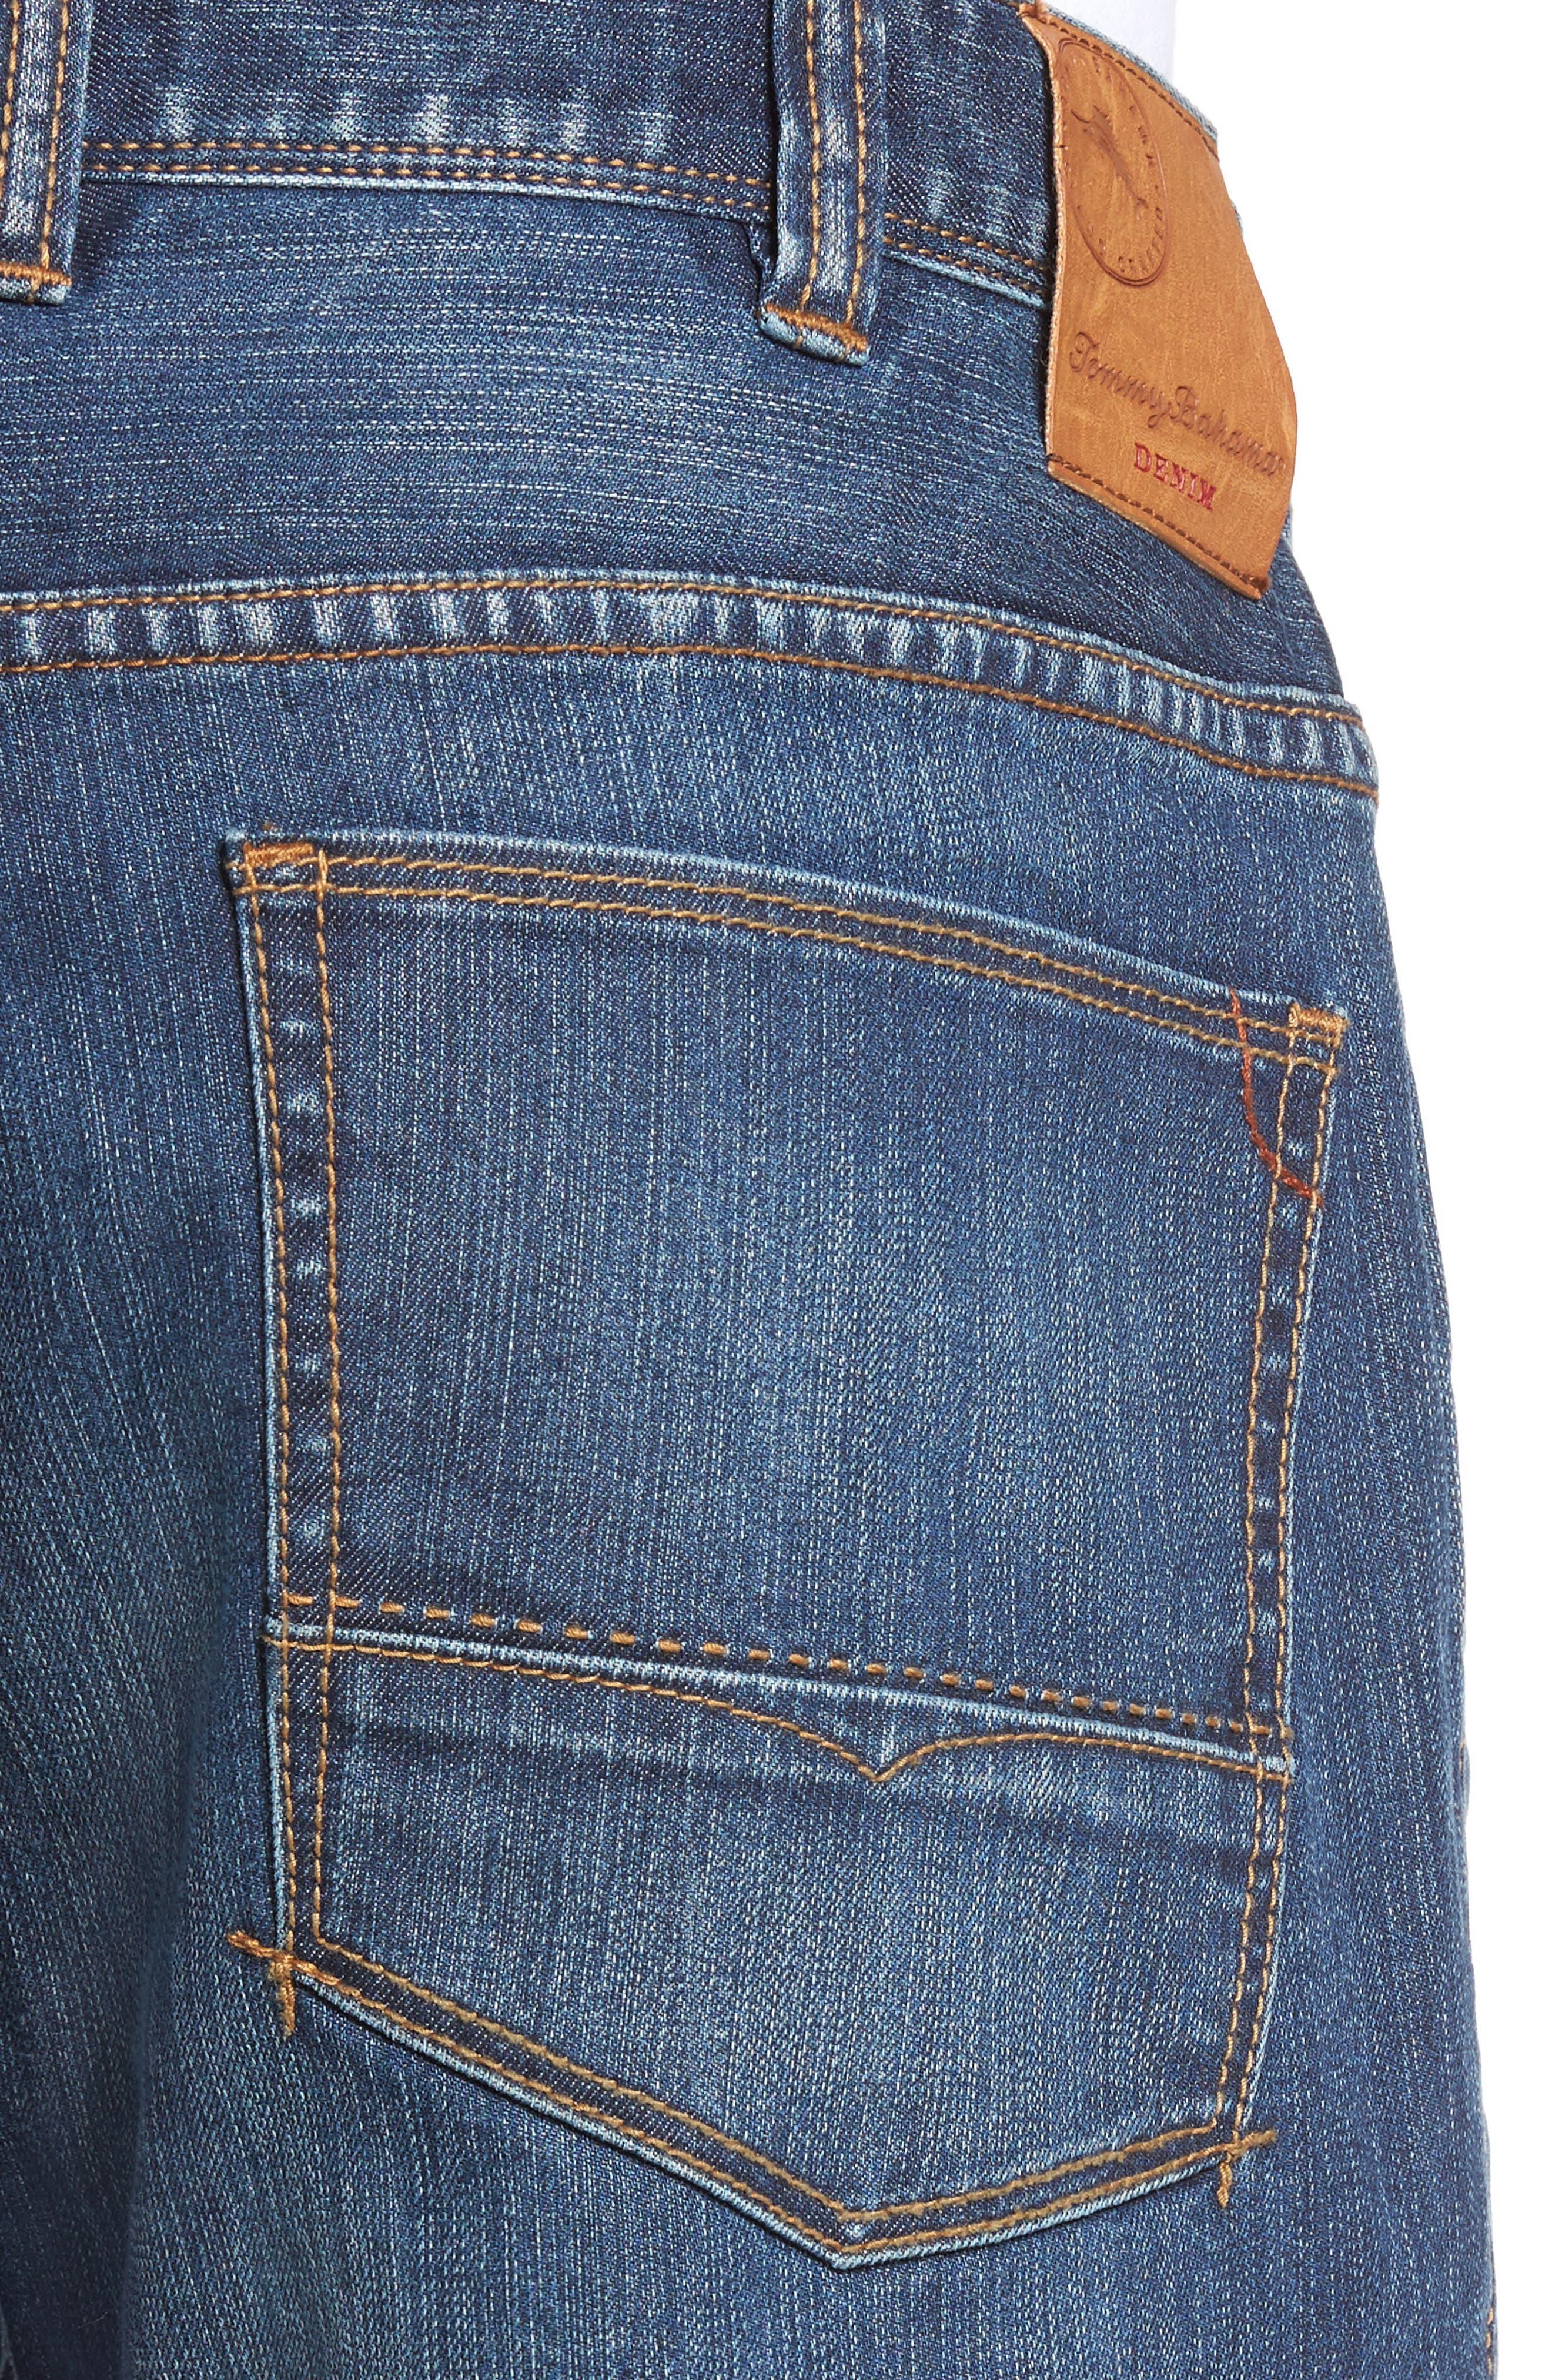 Sorrento Straight Leg Jeans,                             Alternate thumbnail 4, color,                             400